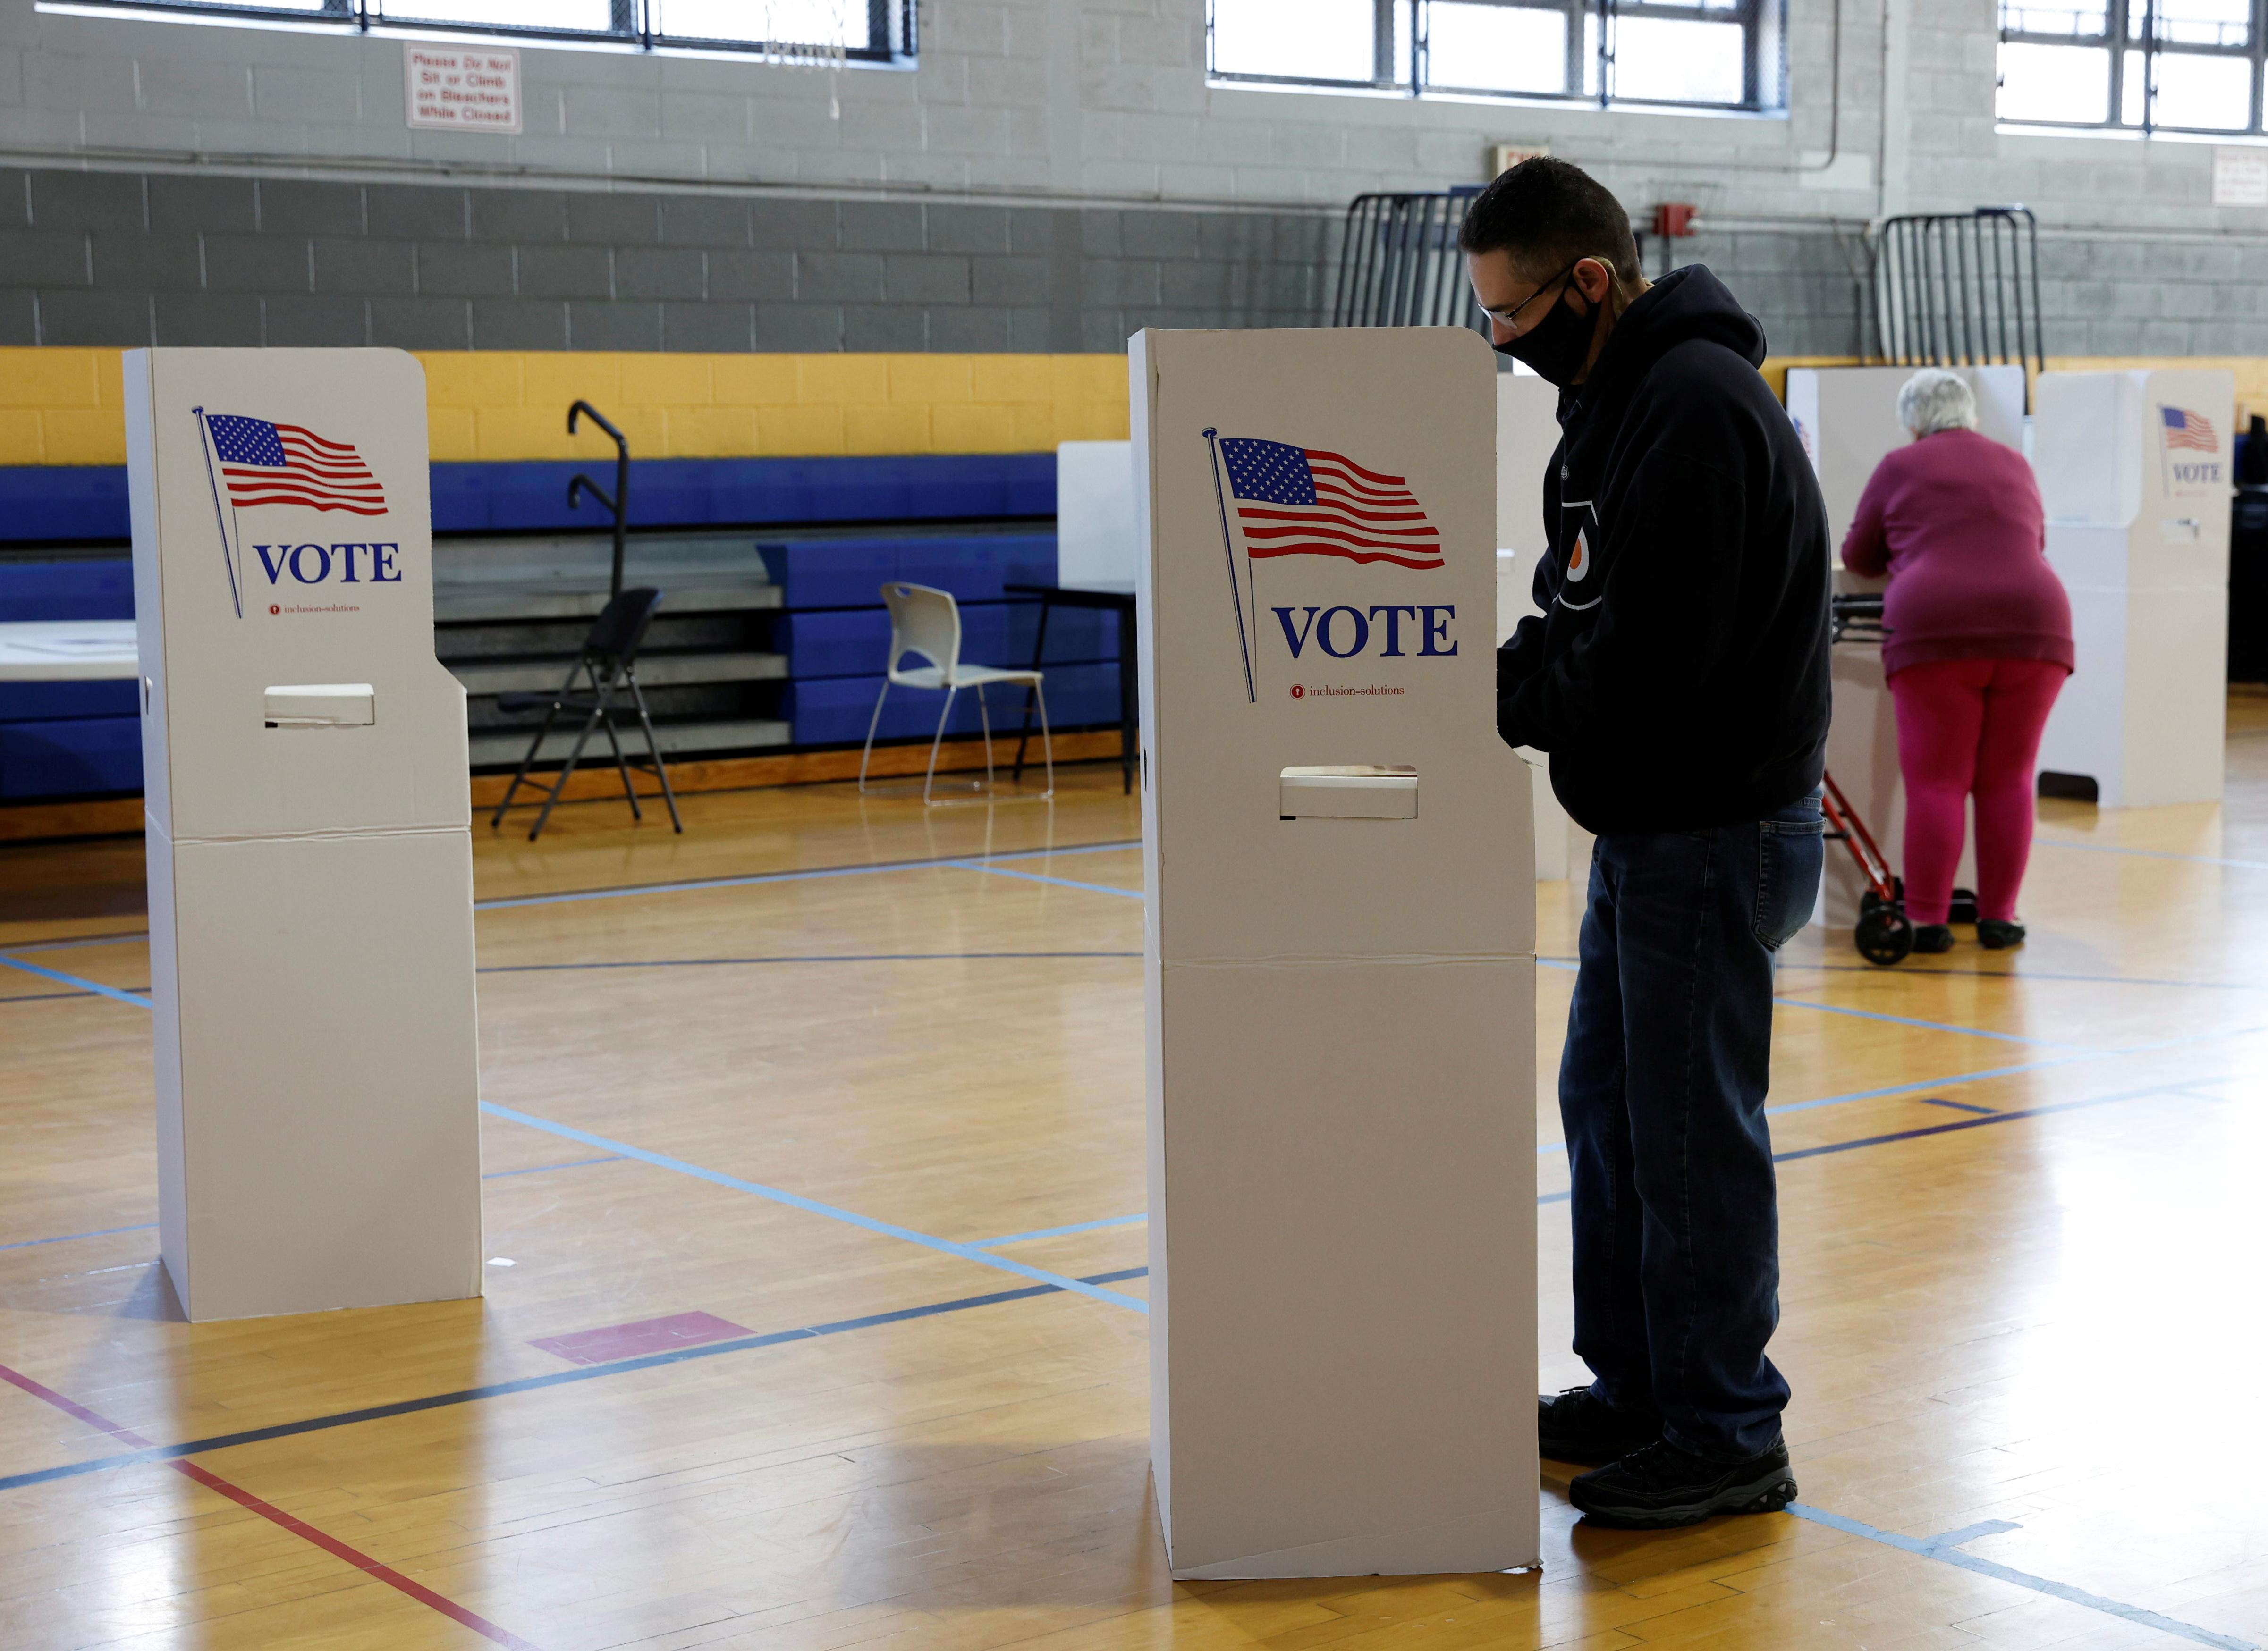 Voters fill out their ballots on Election Day in Conshohocken, Pennsylvania, U.S., November 3, 2020. REUTERS/Rachel Wisniewski